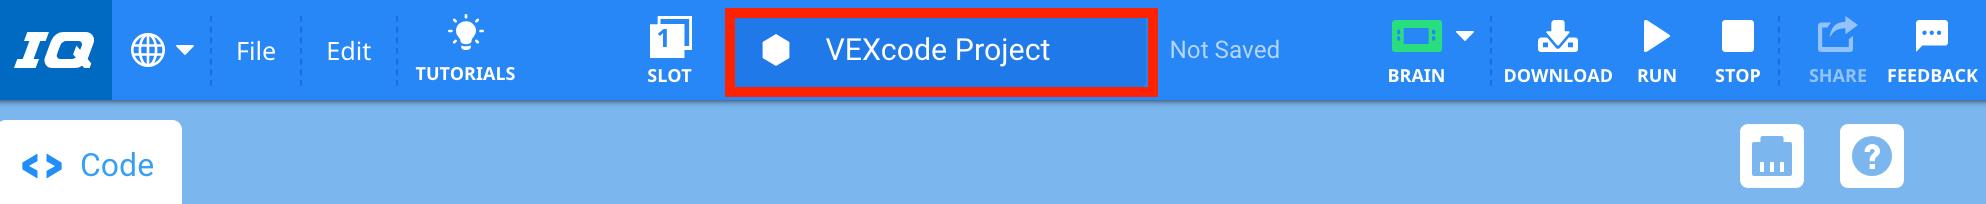 Ventana de nombre de proyecto